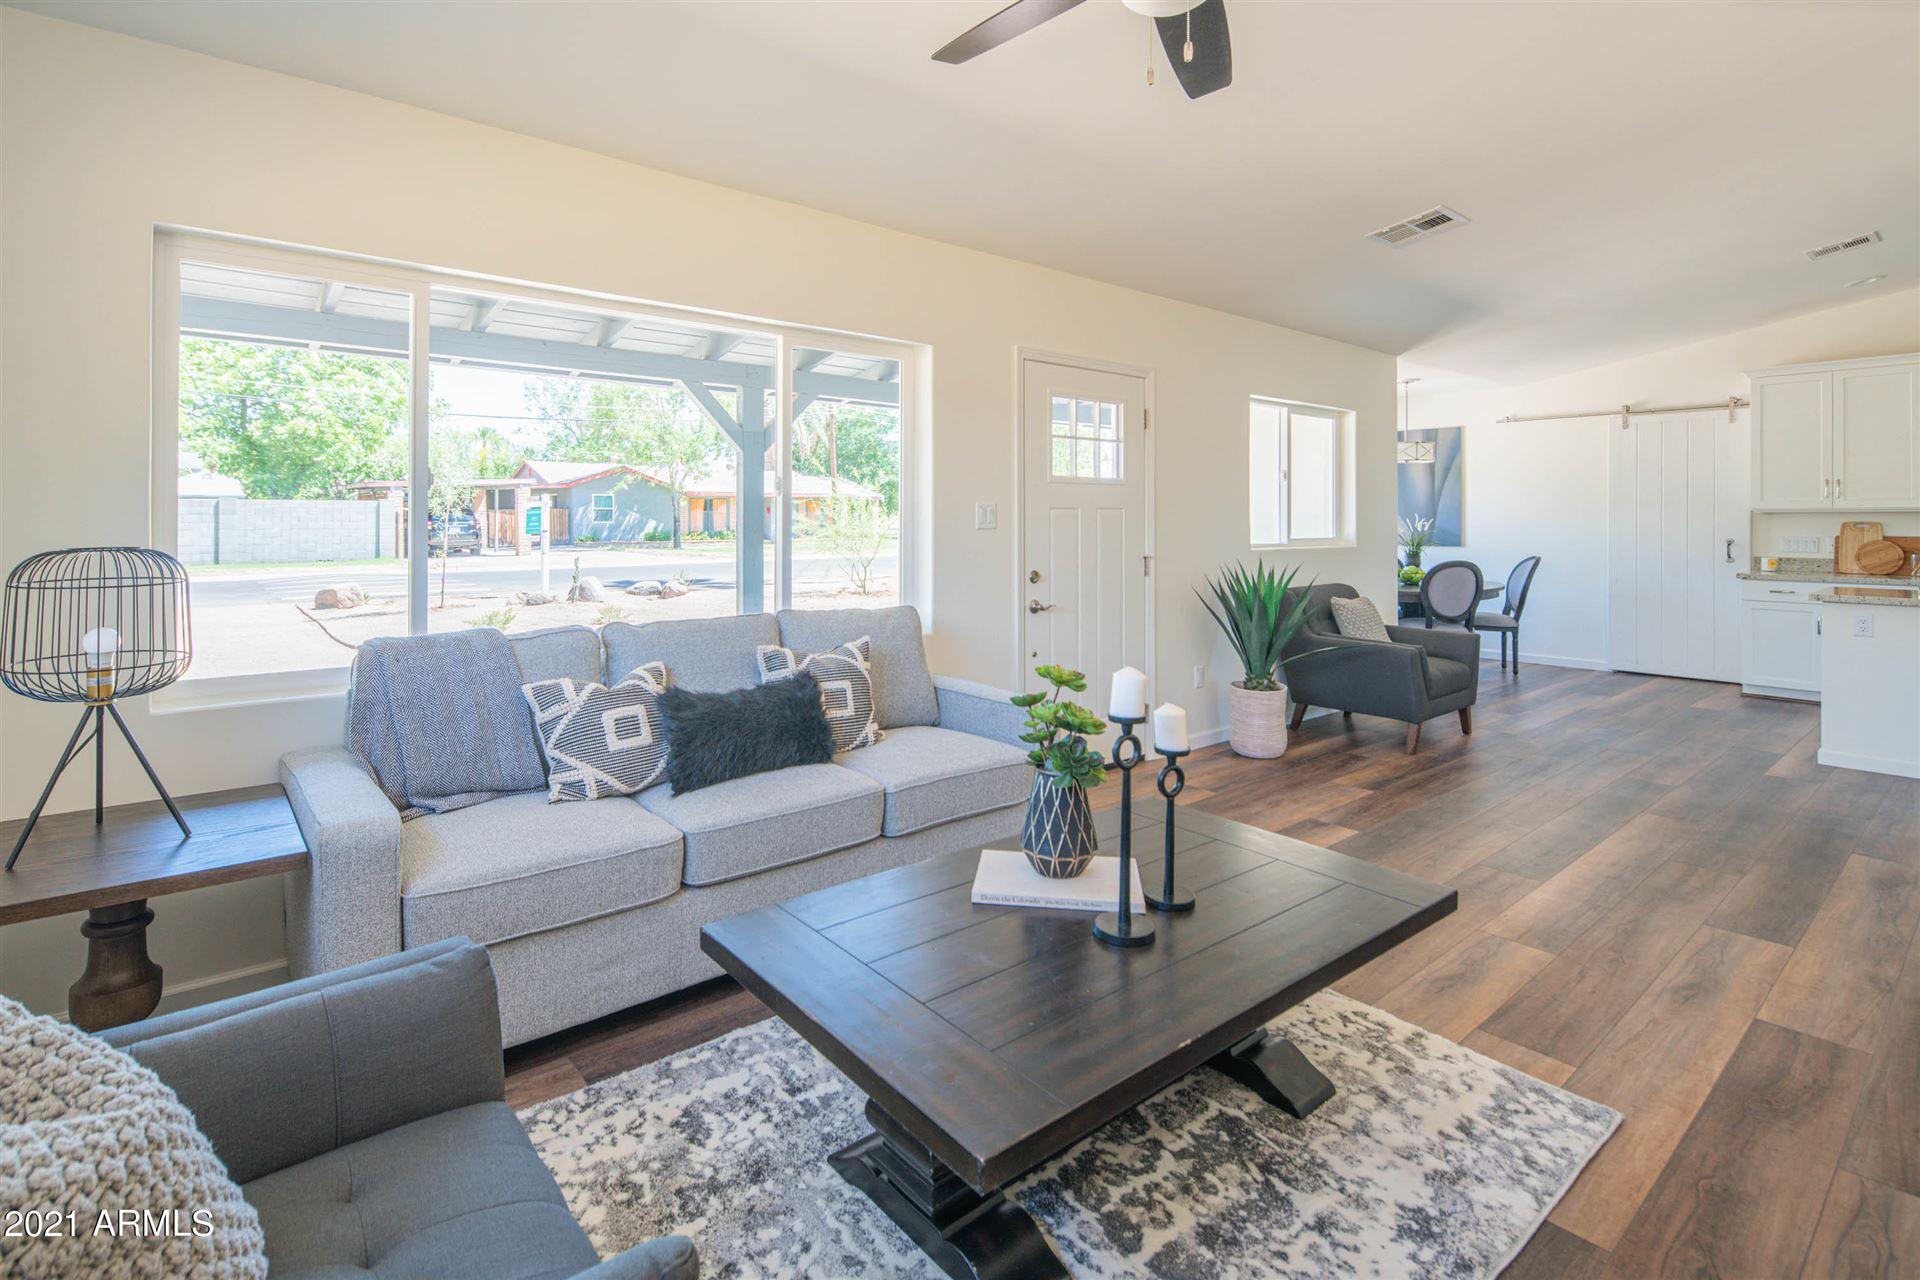 2141 E CLARENDON Avenue, Phoenix, AZ 85016 - #: 6235308